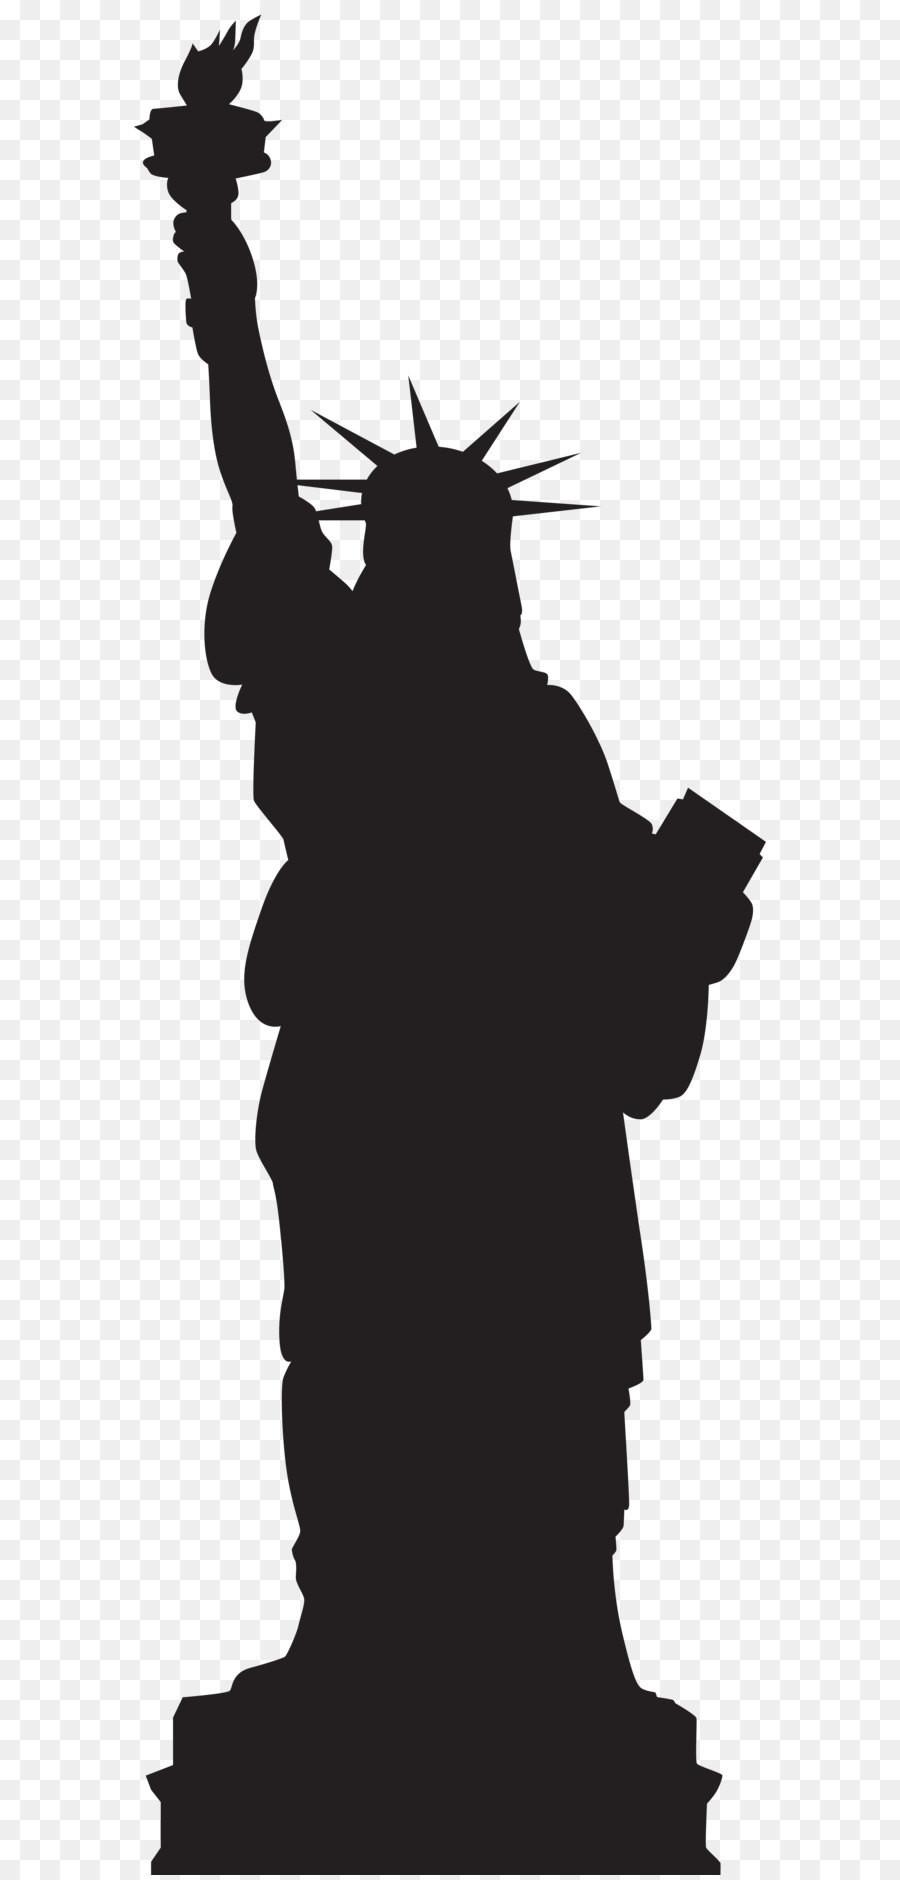 900x1880 Statue Of Liberty New York Harbor Ellis Island Freedom Fine